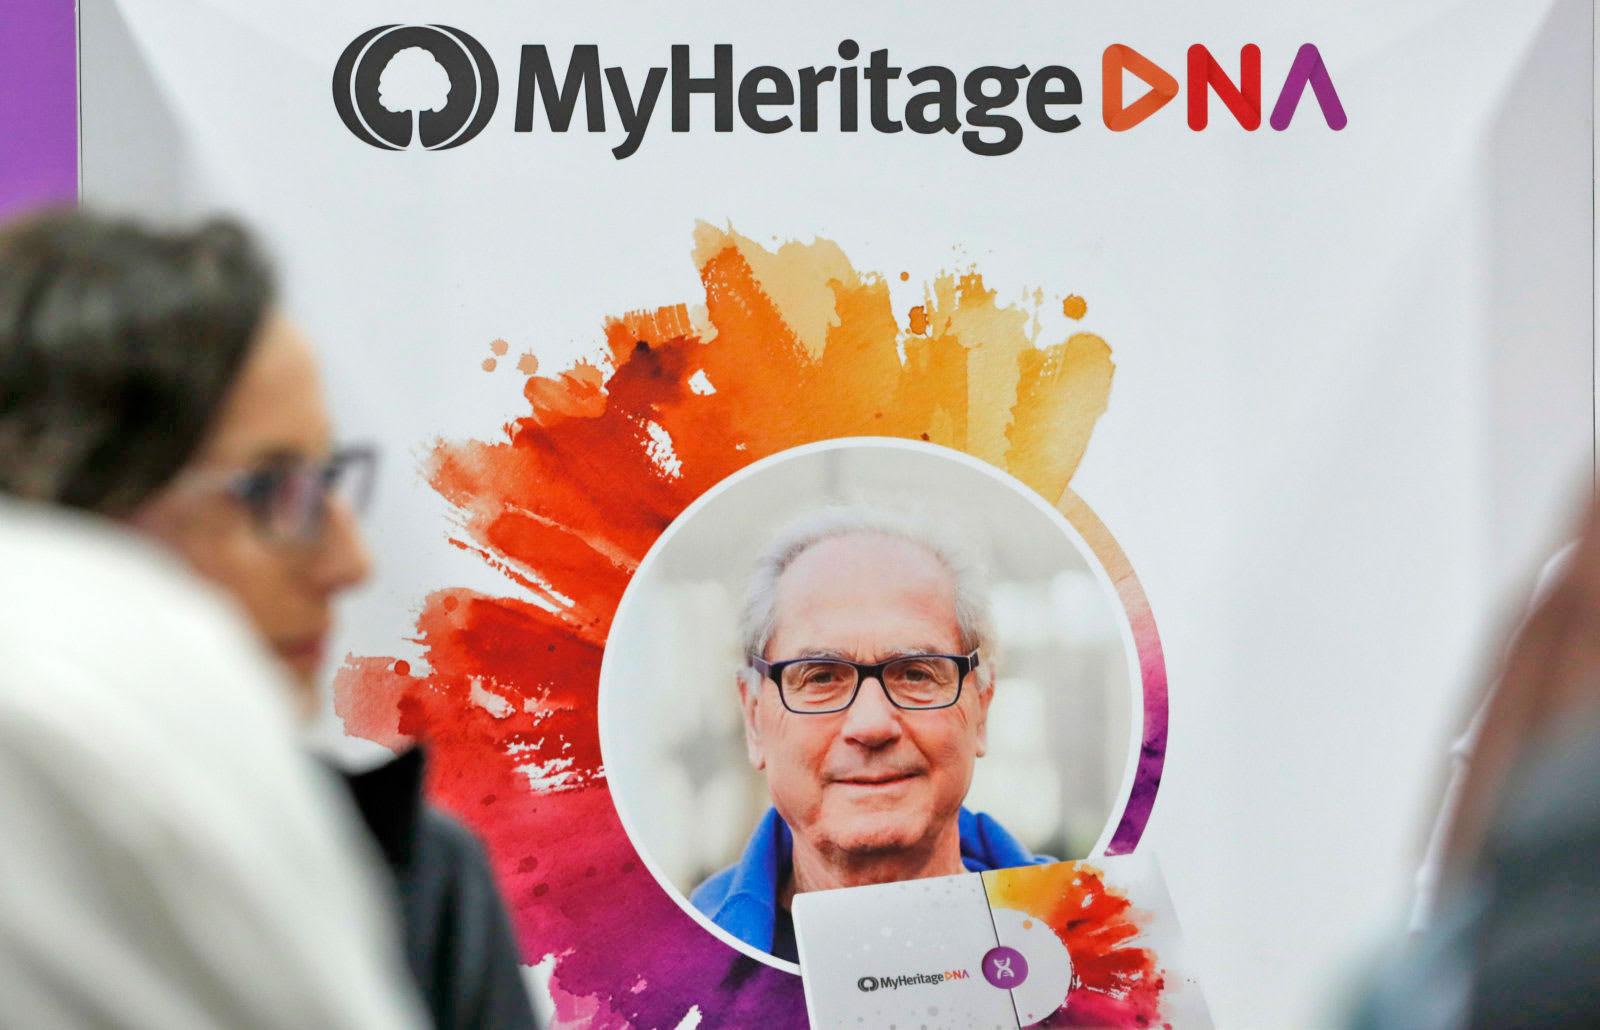 MyHeritage admits 92 million user email addresses were leaked